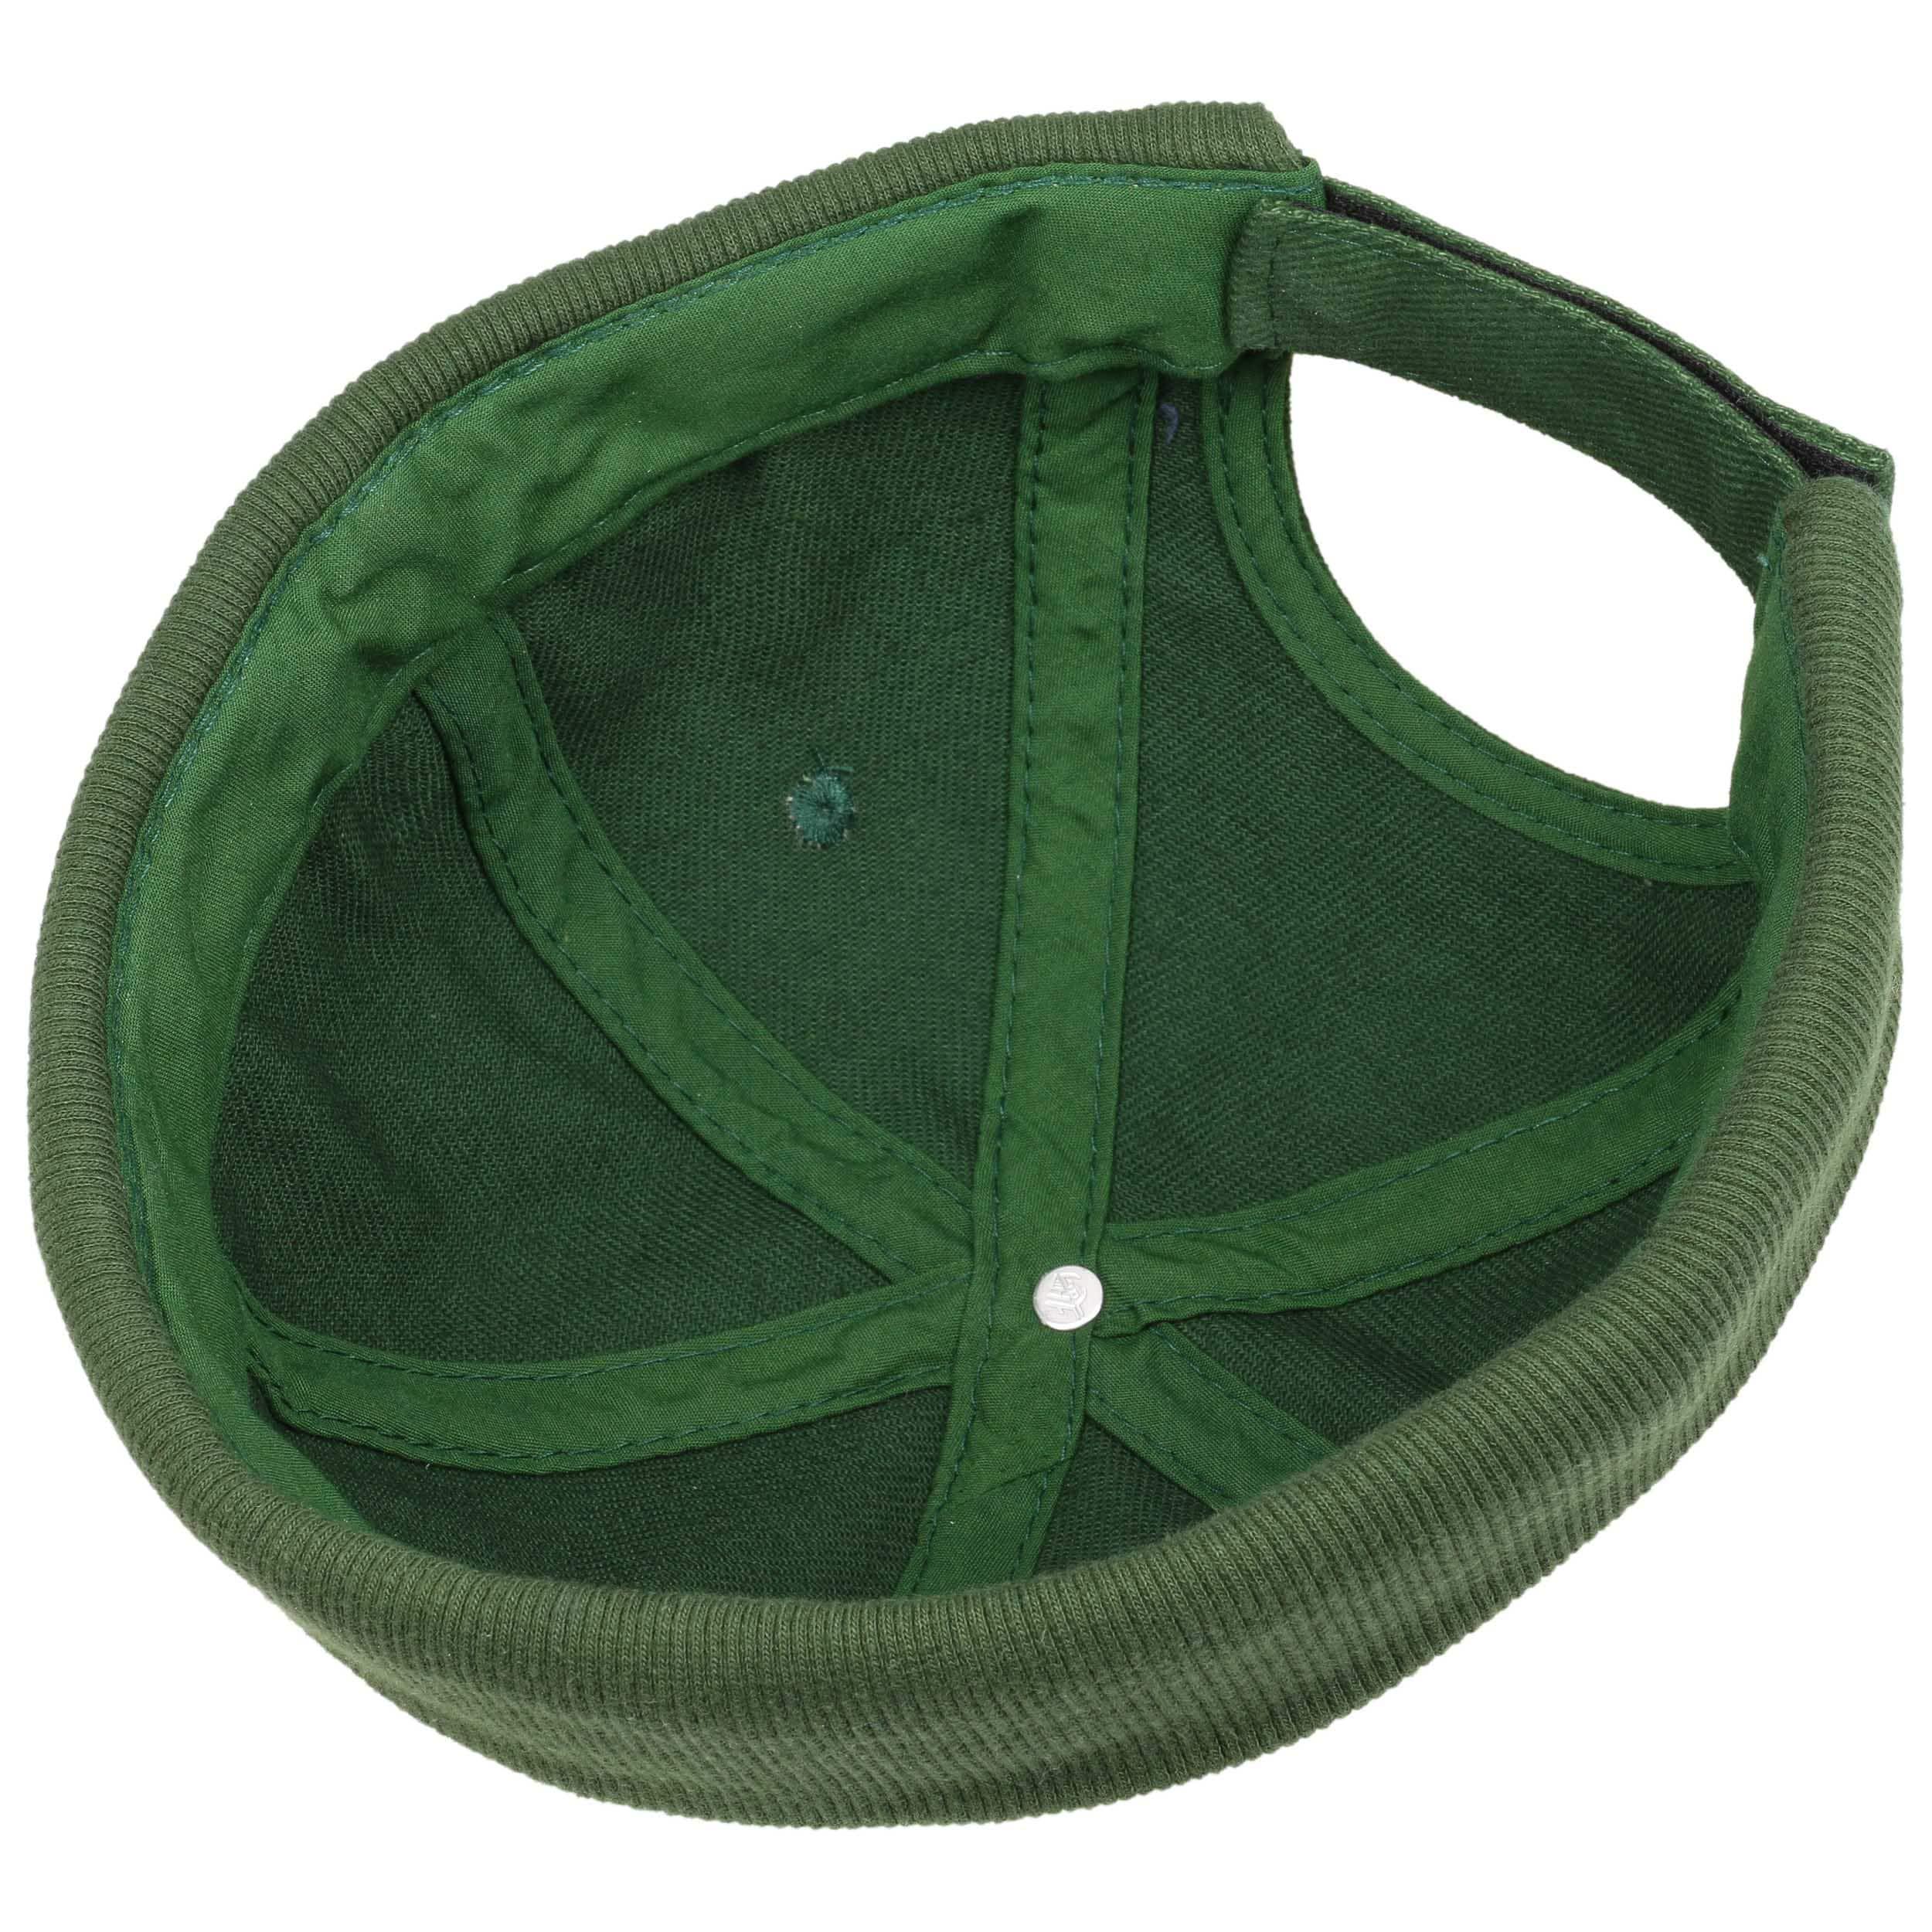 ... Calotta in Cotone Docker Cap - verde scuro 2 ... 90b8006dab88